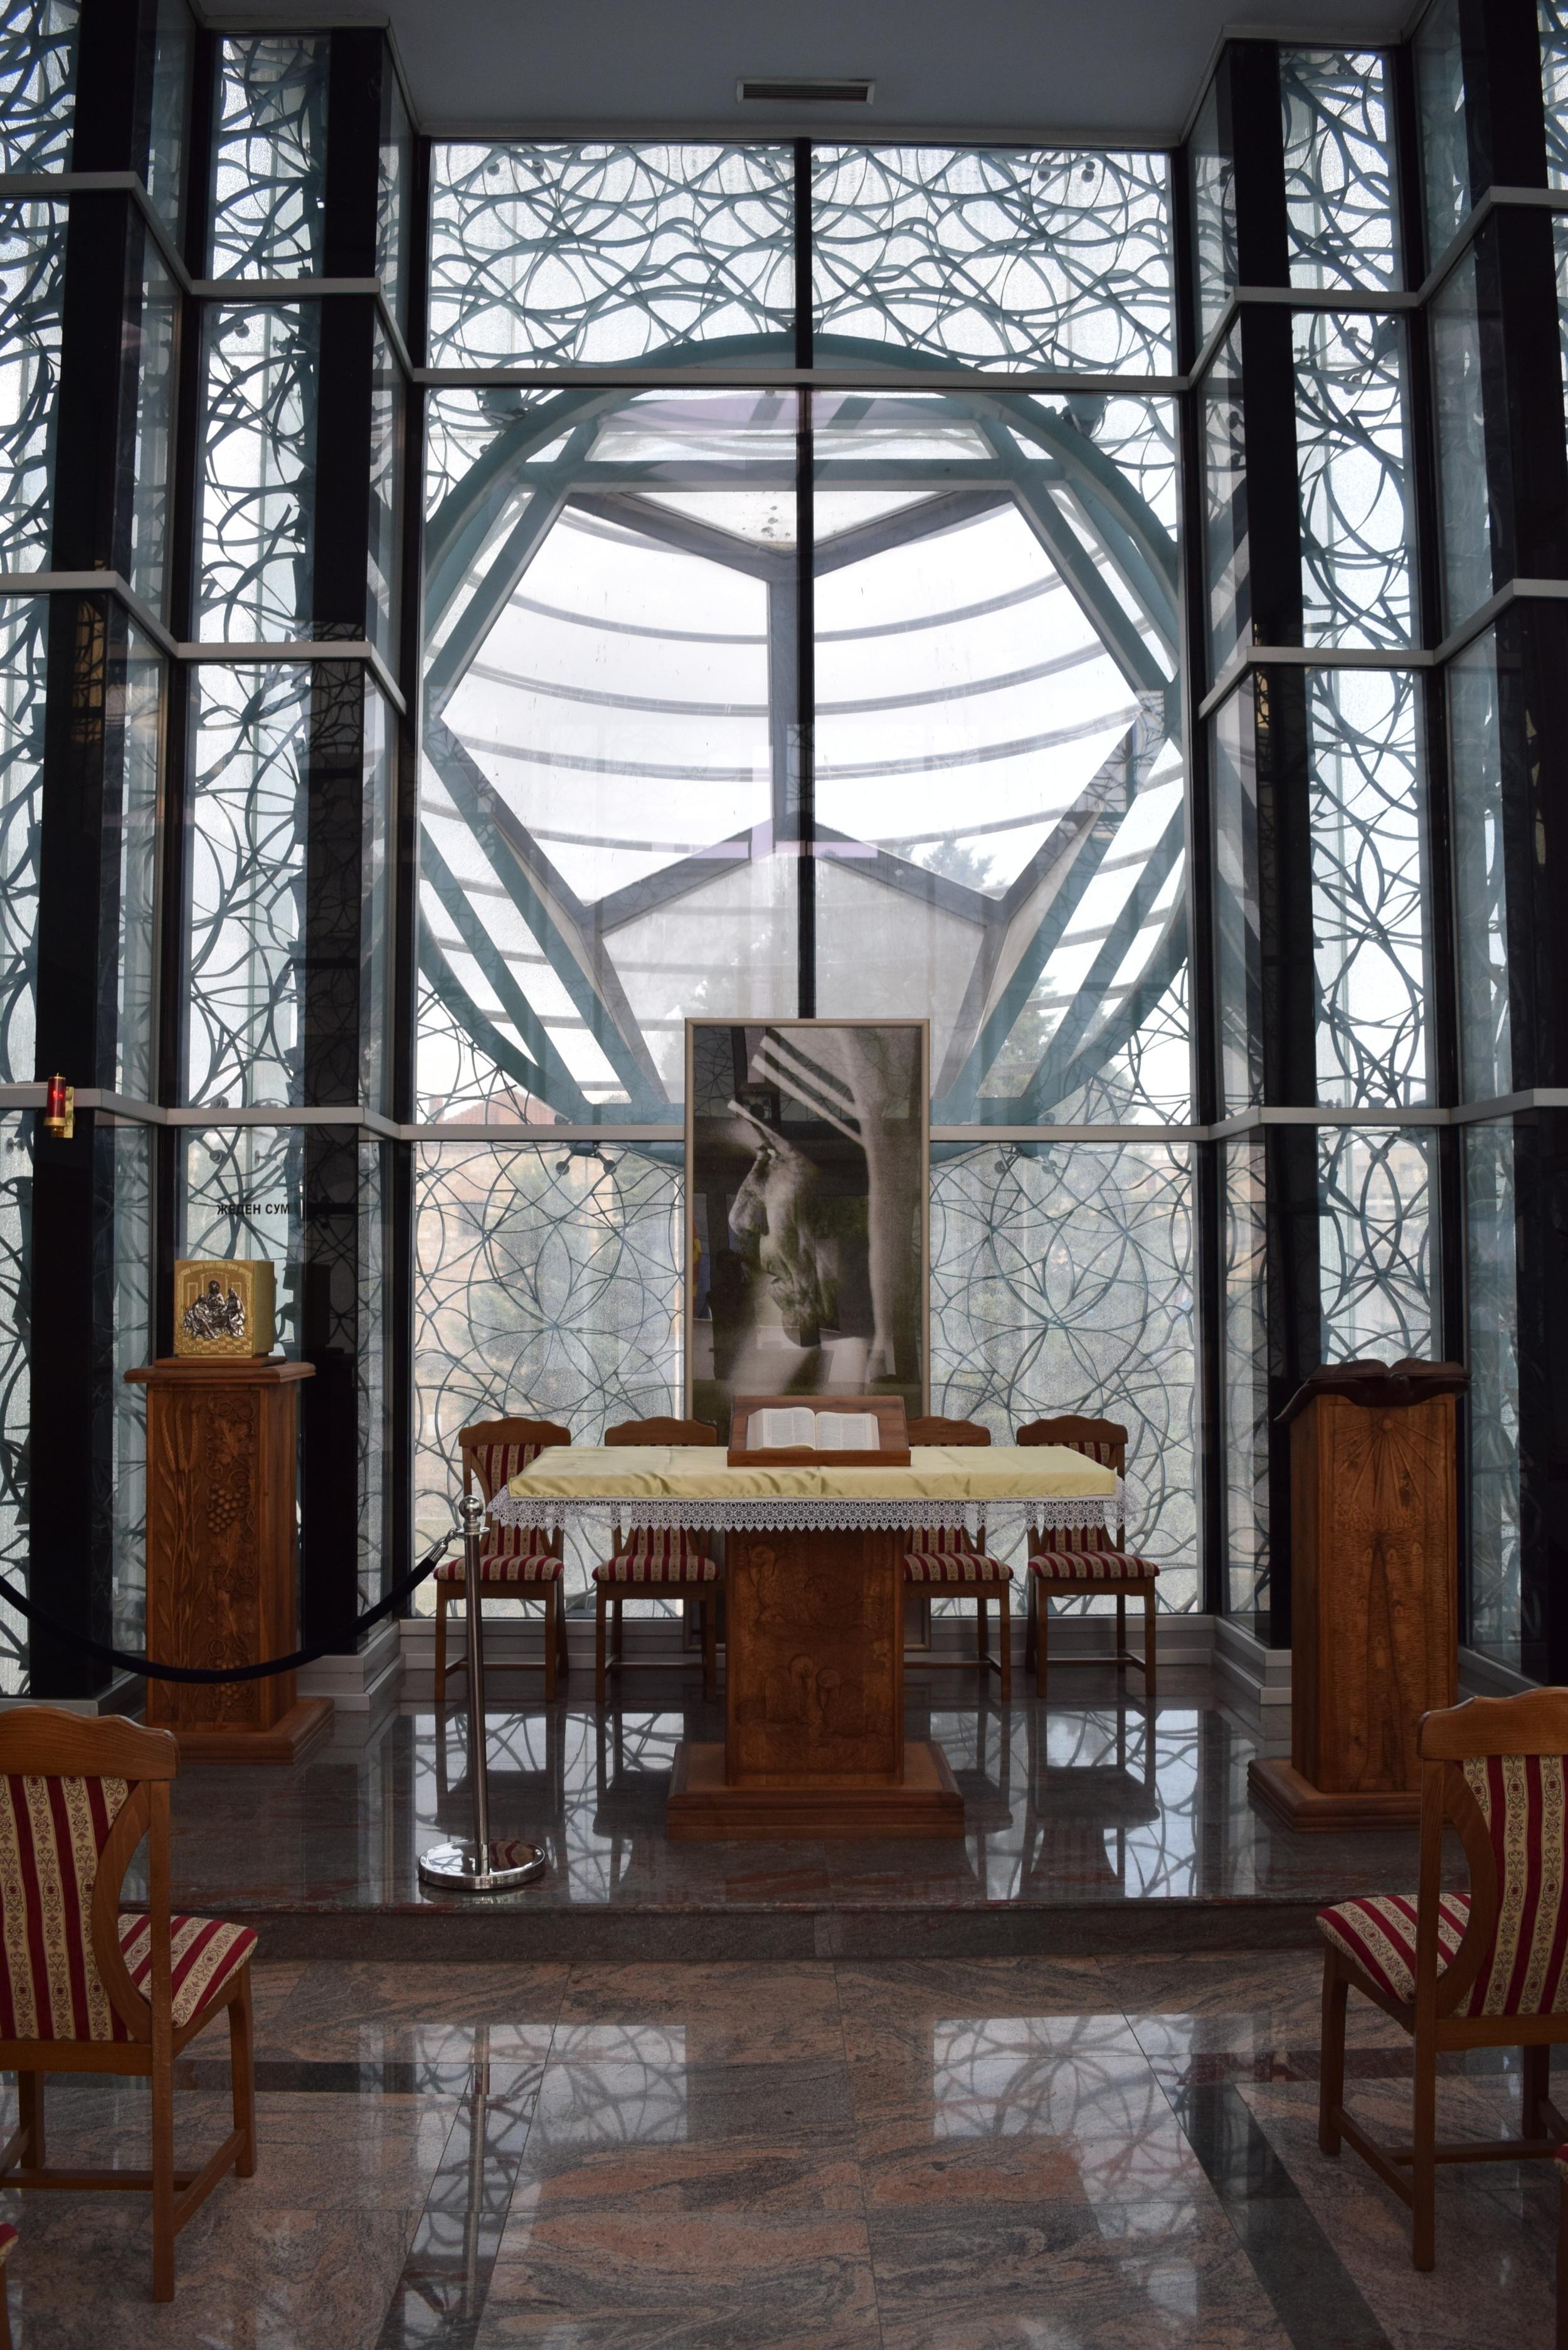 Chapel insideMother Teresa Memorial House